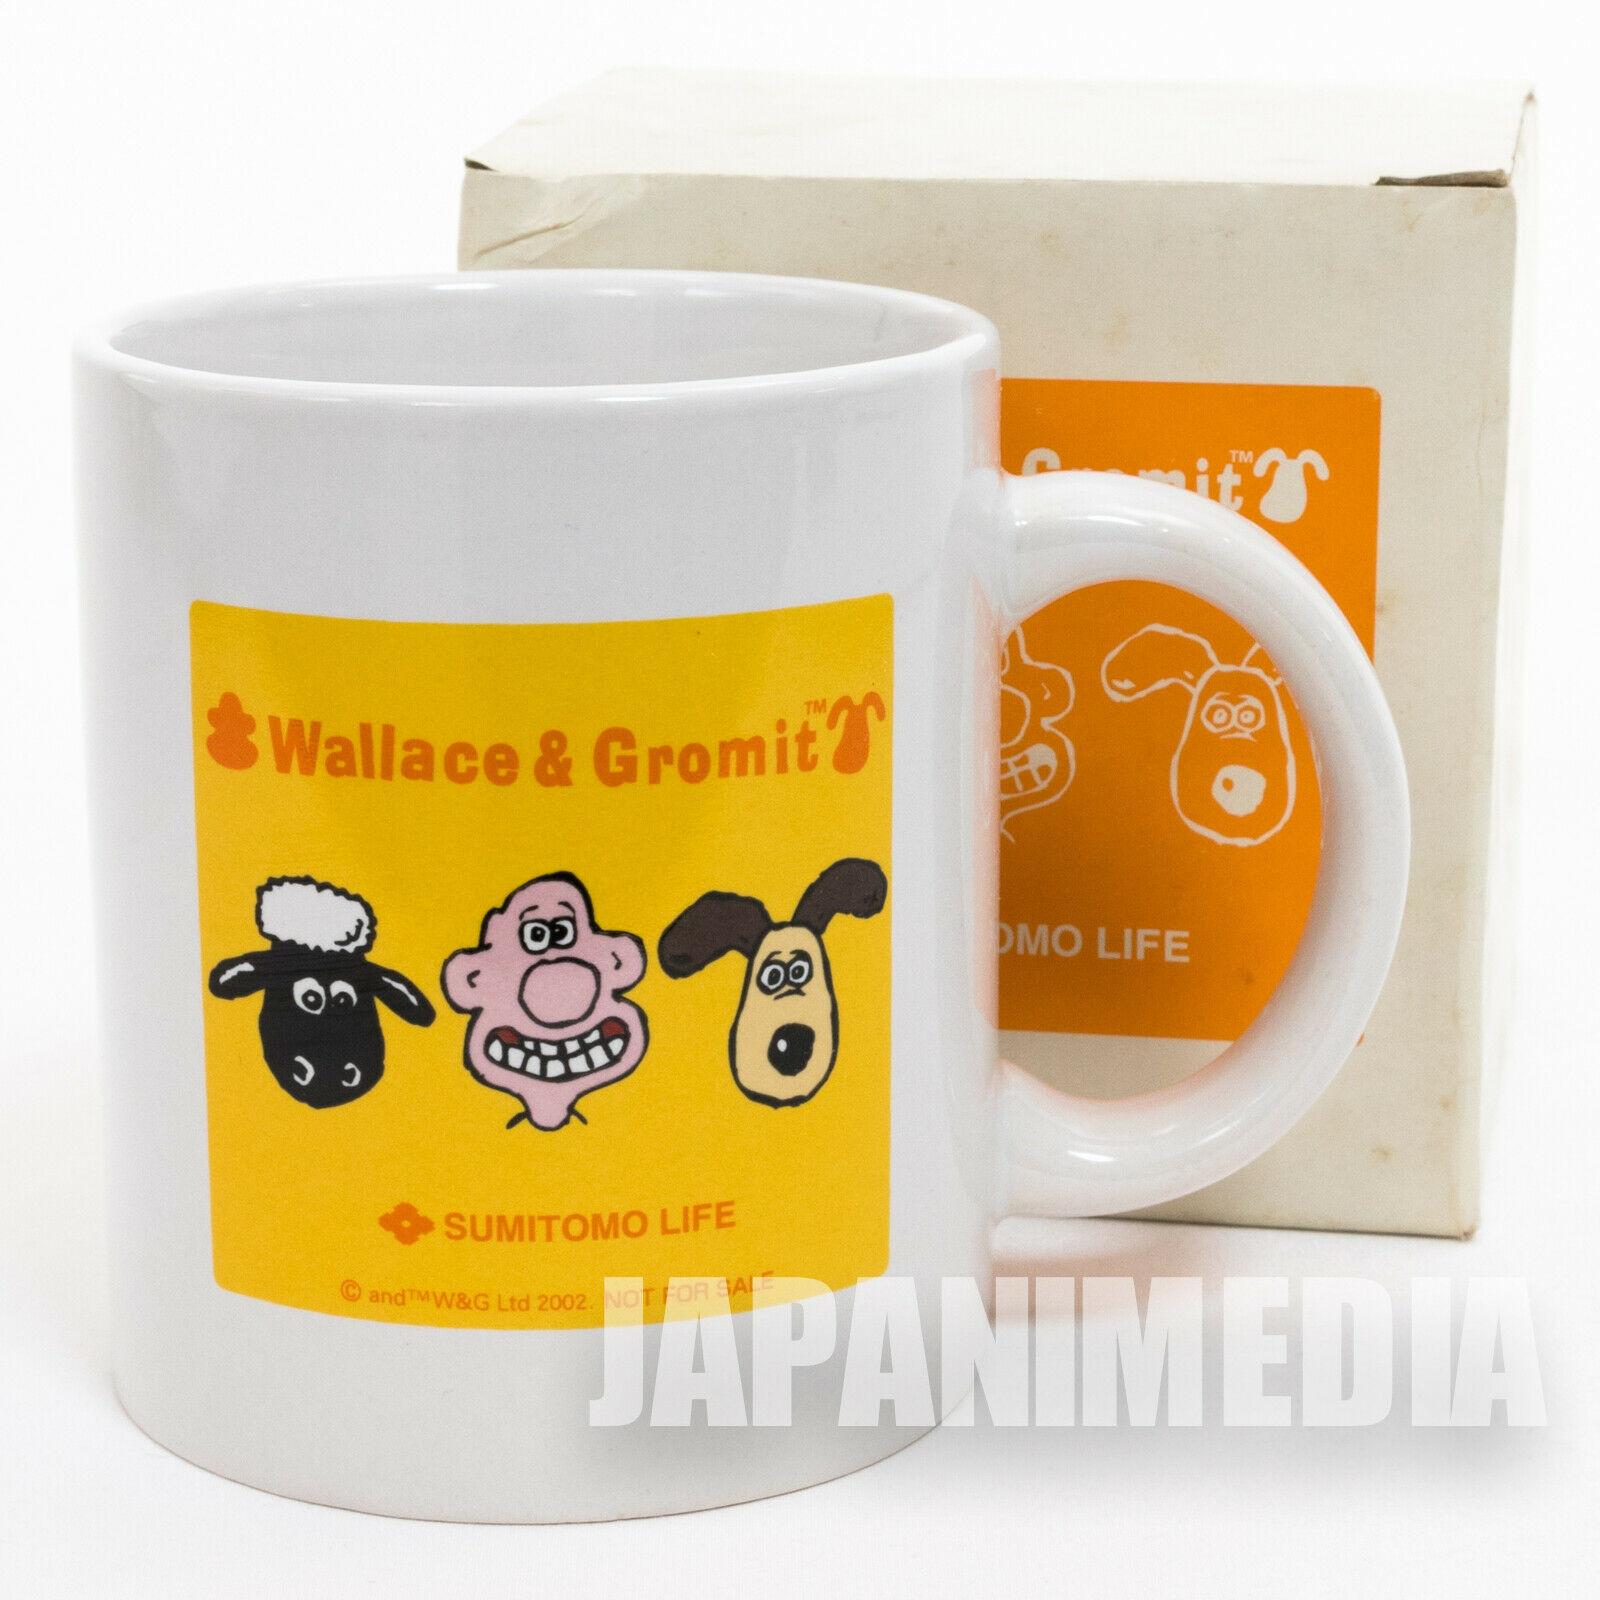 Wallace & Gromit MUG Sumitomo Life Novelty JAPAN Ardman ANIME 3